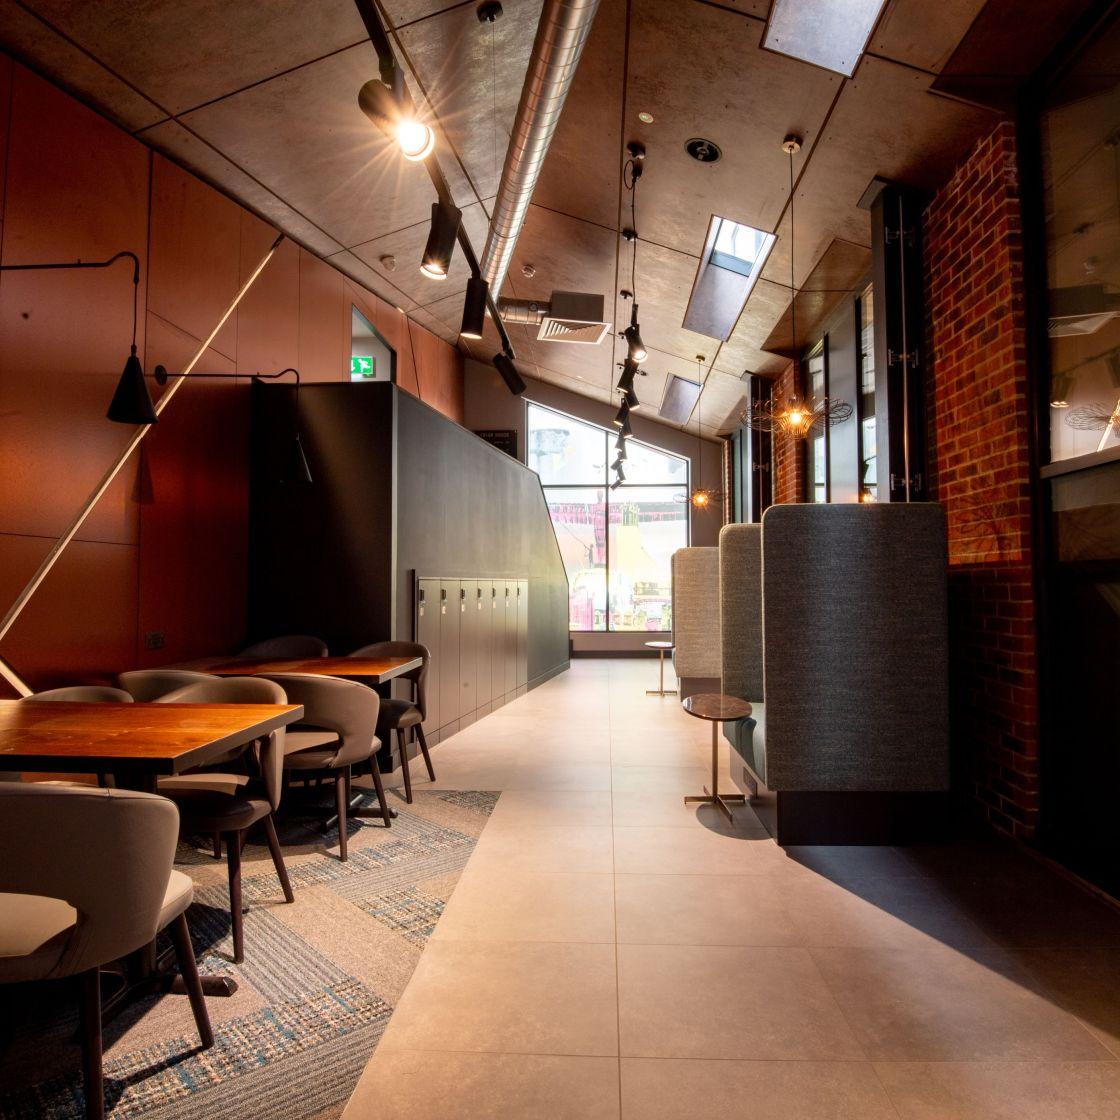 IconInc @ Roomzzz Newcastle Reception Lounge. Student Accommodation in Newcastle